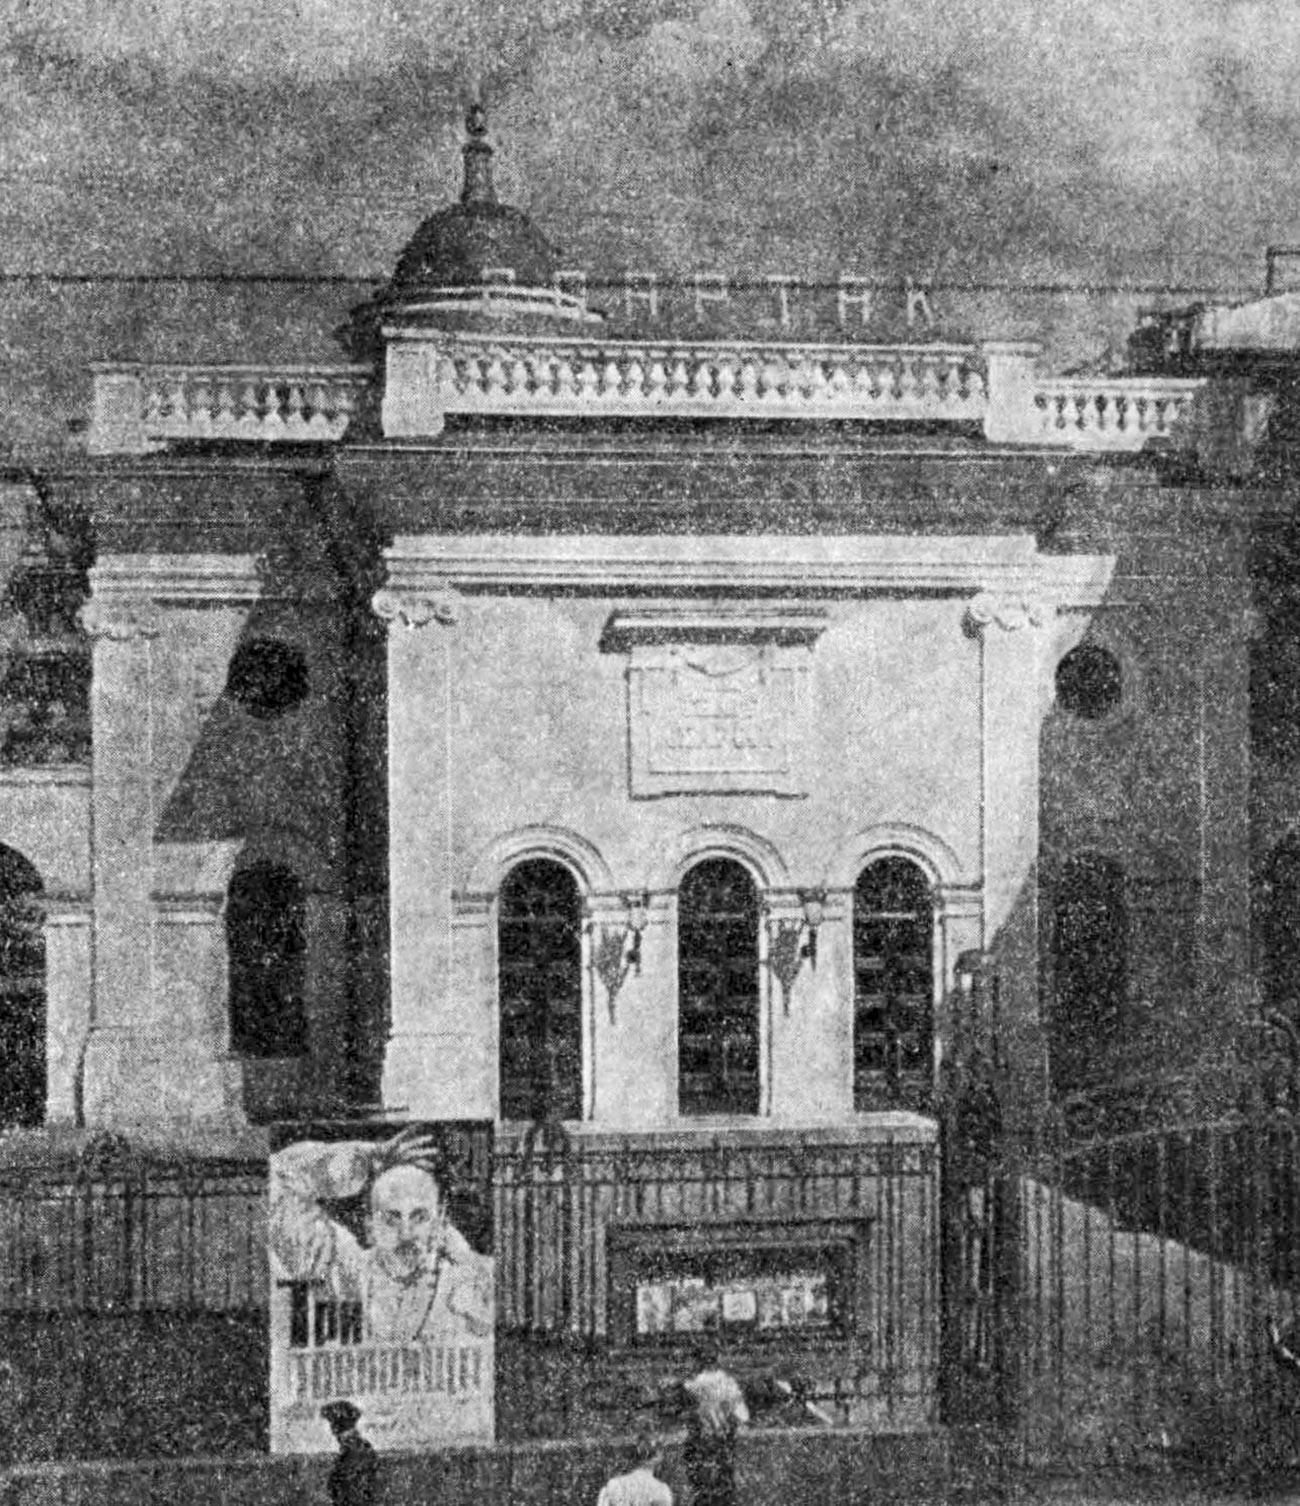 Il cinema Spartak